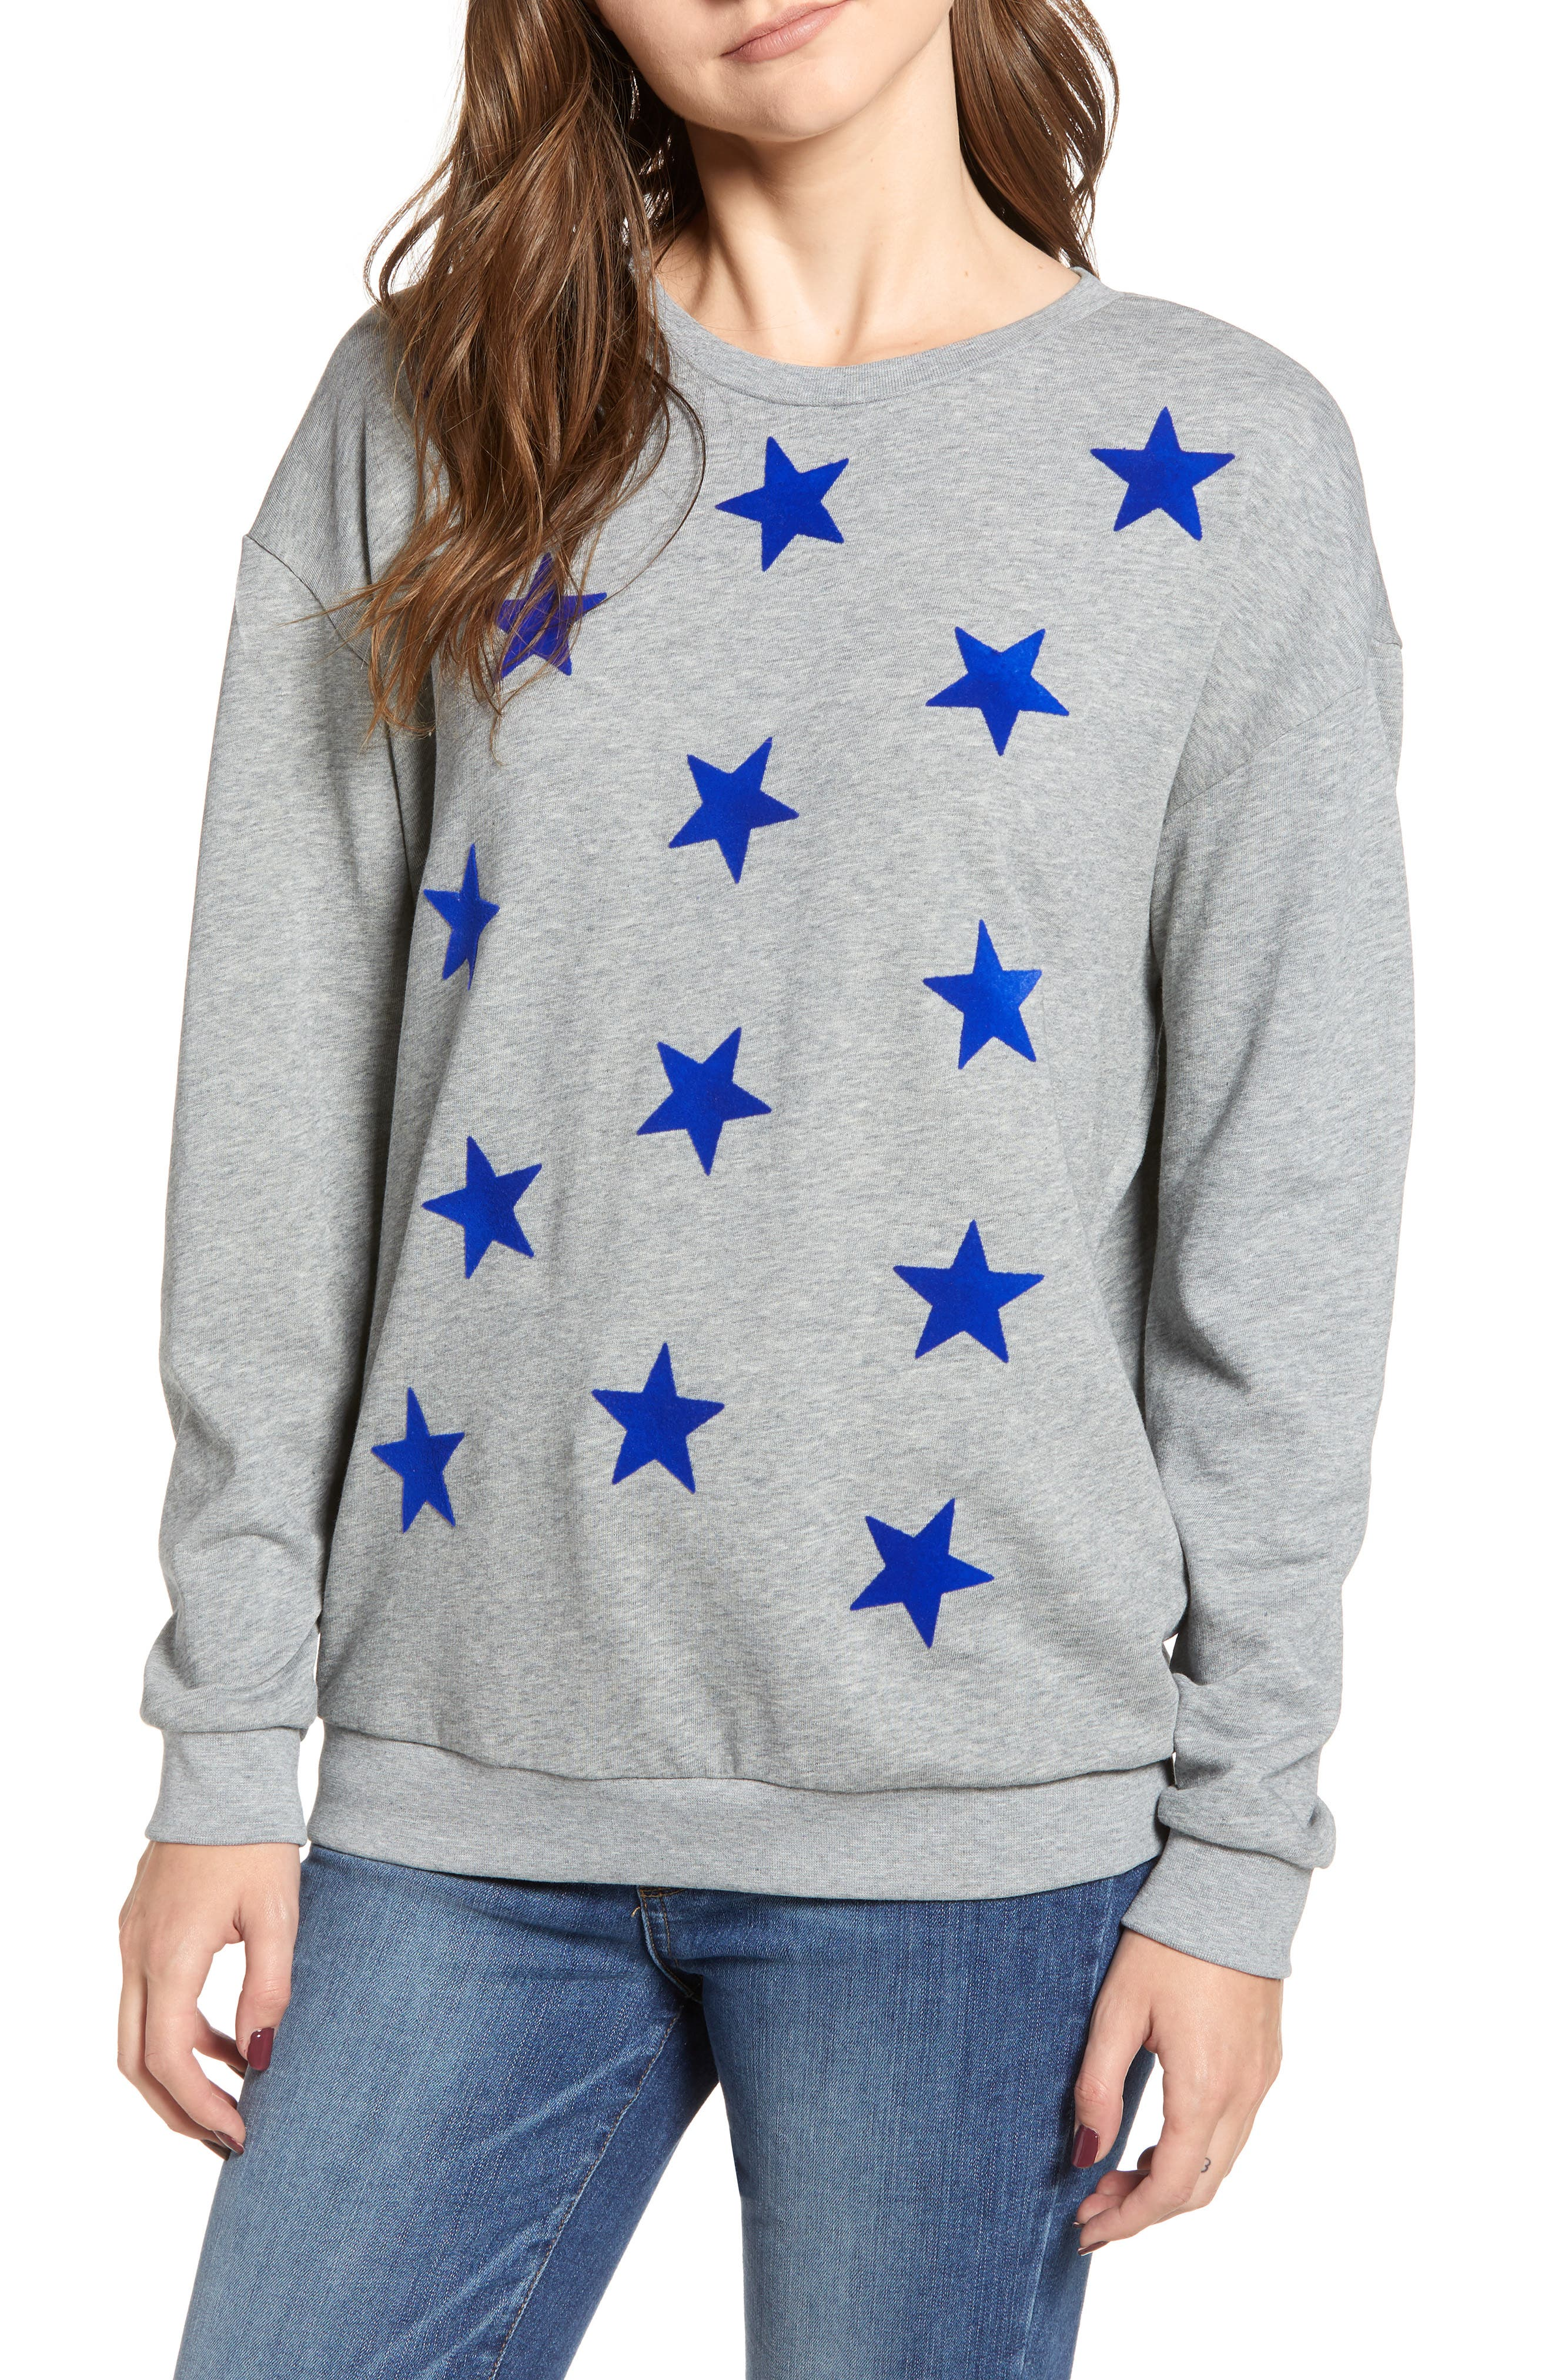 Alexa Stars Sweatshirt,                         Main,                         color, GREY